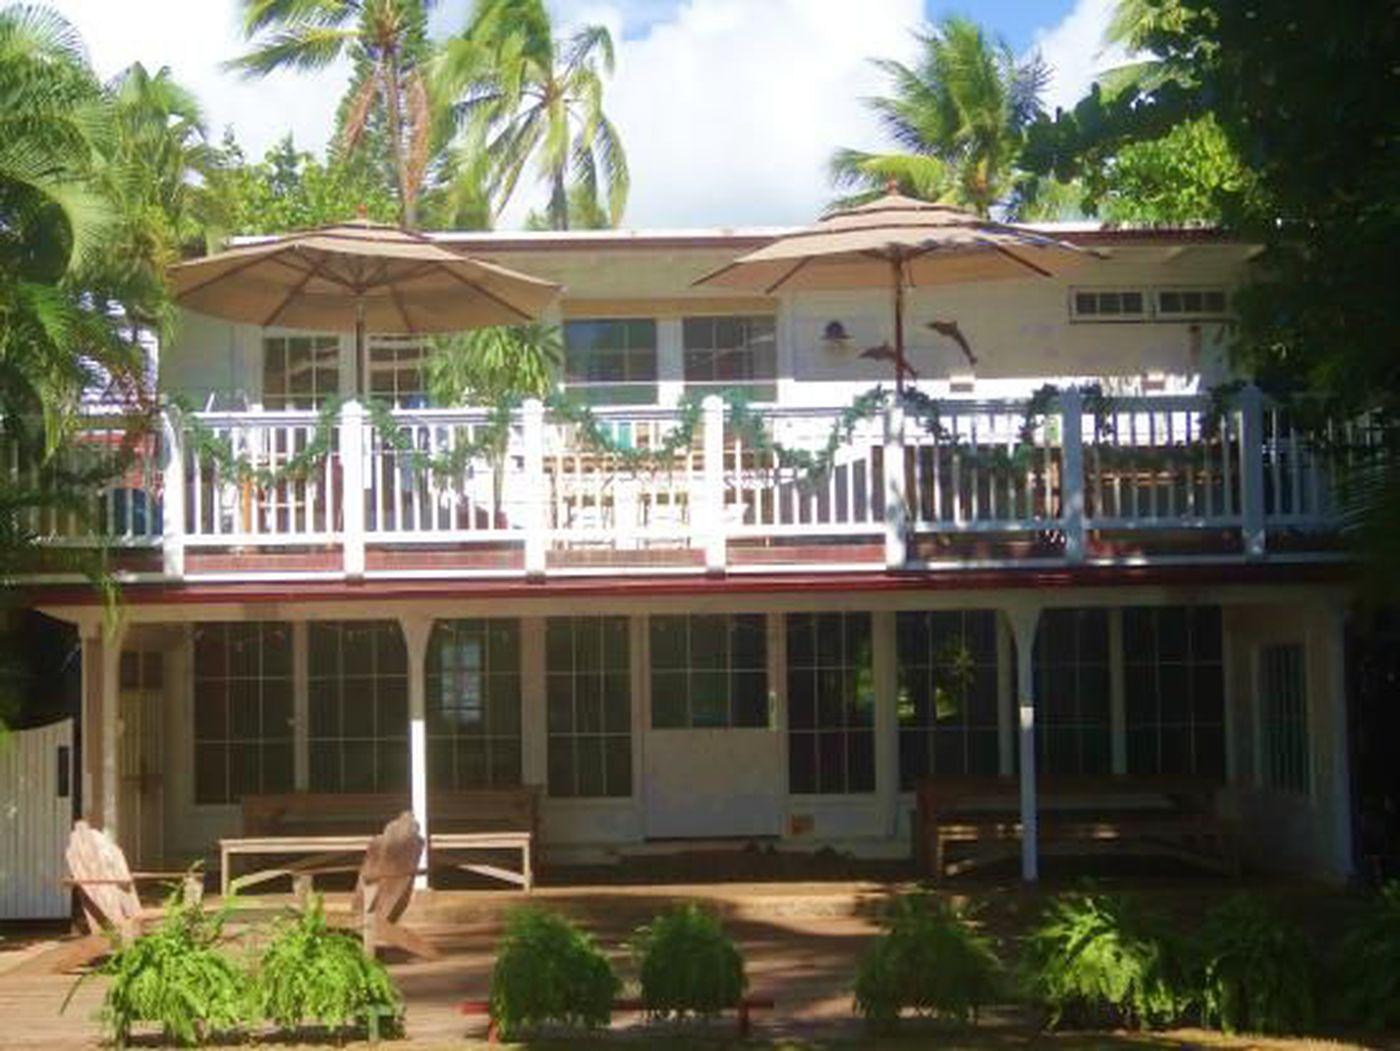 Take a tour of Steve McGarrett's beachfront 'Hawaii Five-0' home